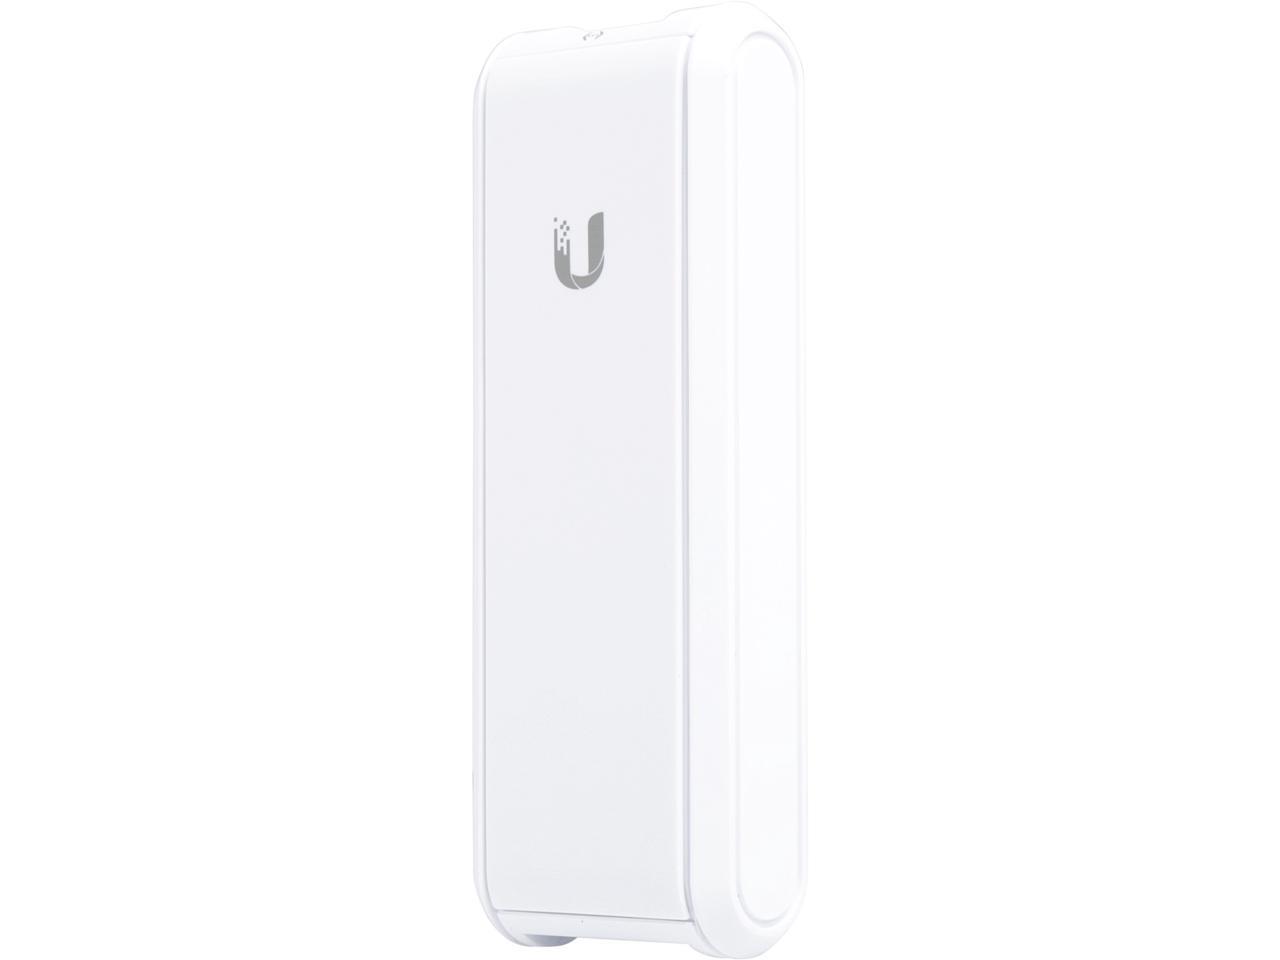 Ubiquiti Cloud Key (UC-CK) UniFi controller - $68.39 after coupon - Free Shipping - Newegg